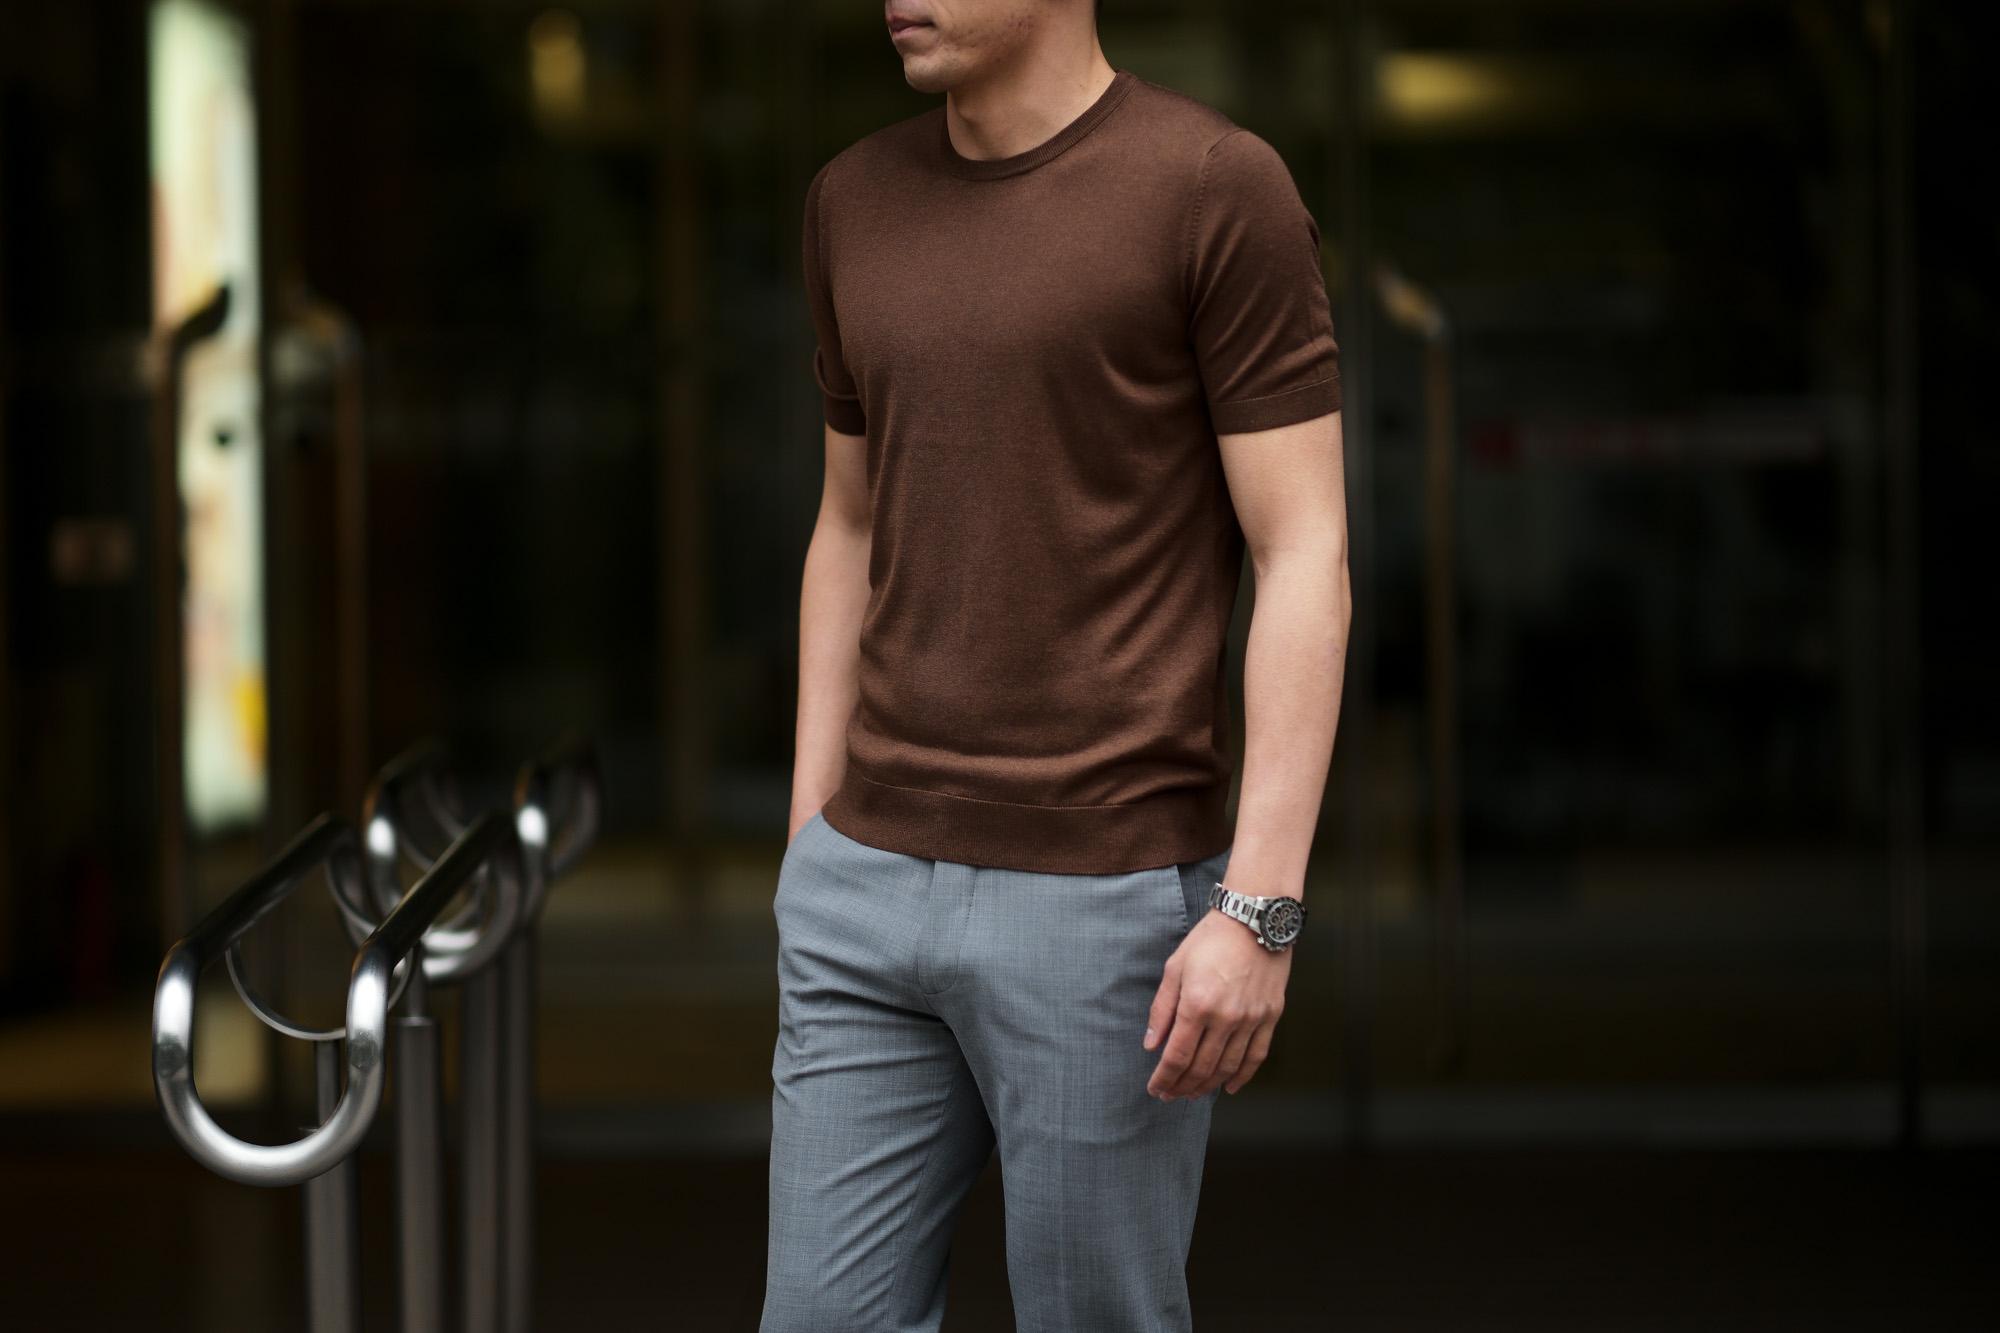 Gran Sasso (グランサッソ) Silk Knit T-shirt (シルクニット Tシャツ) SETA (シルク 100%) ショートスリーブ シルク ニット Tシャツ GOLD (ゴールド・170) made in italy (イタリア製) 2020 春夏新作 gransasso 愛知 名古屋 altoediritto アルトエデリット